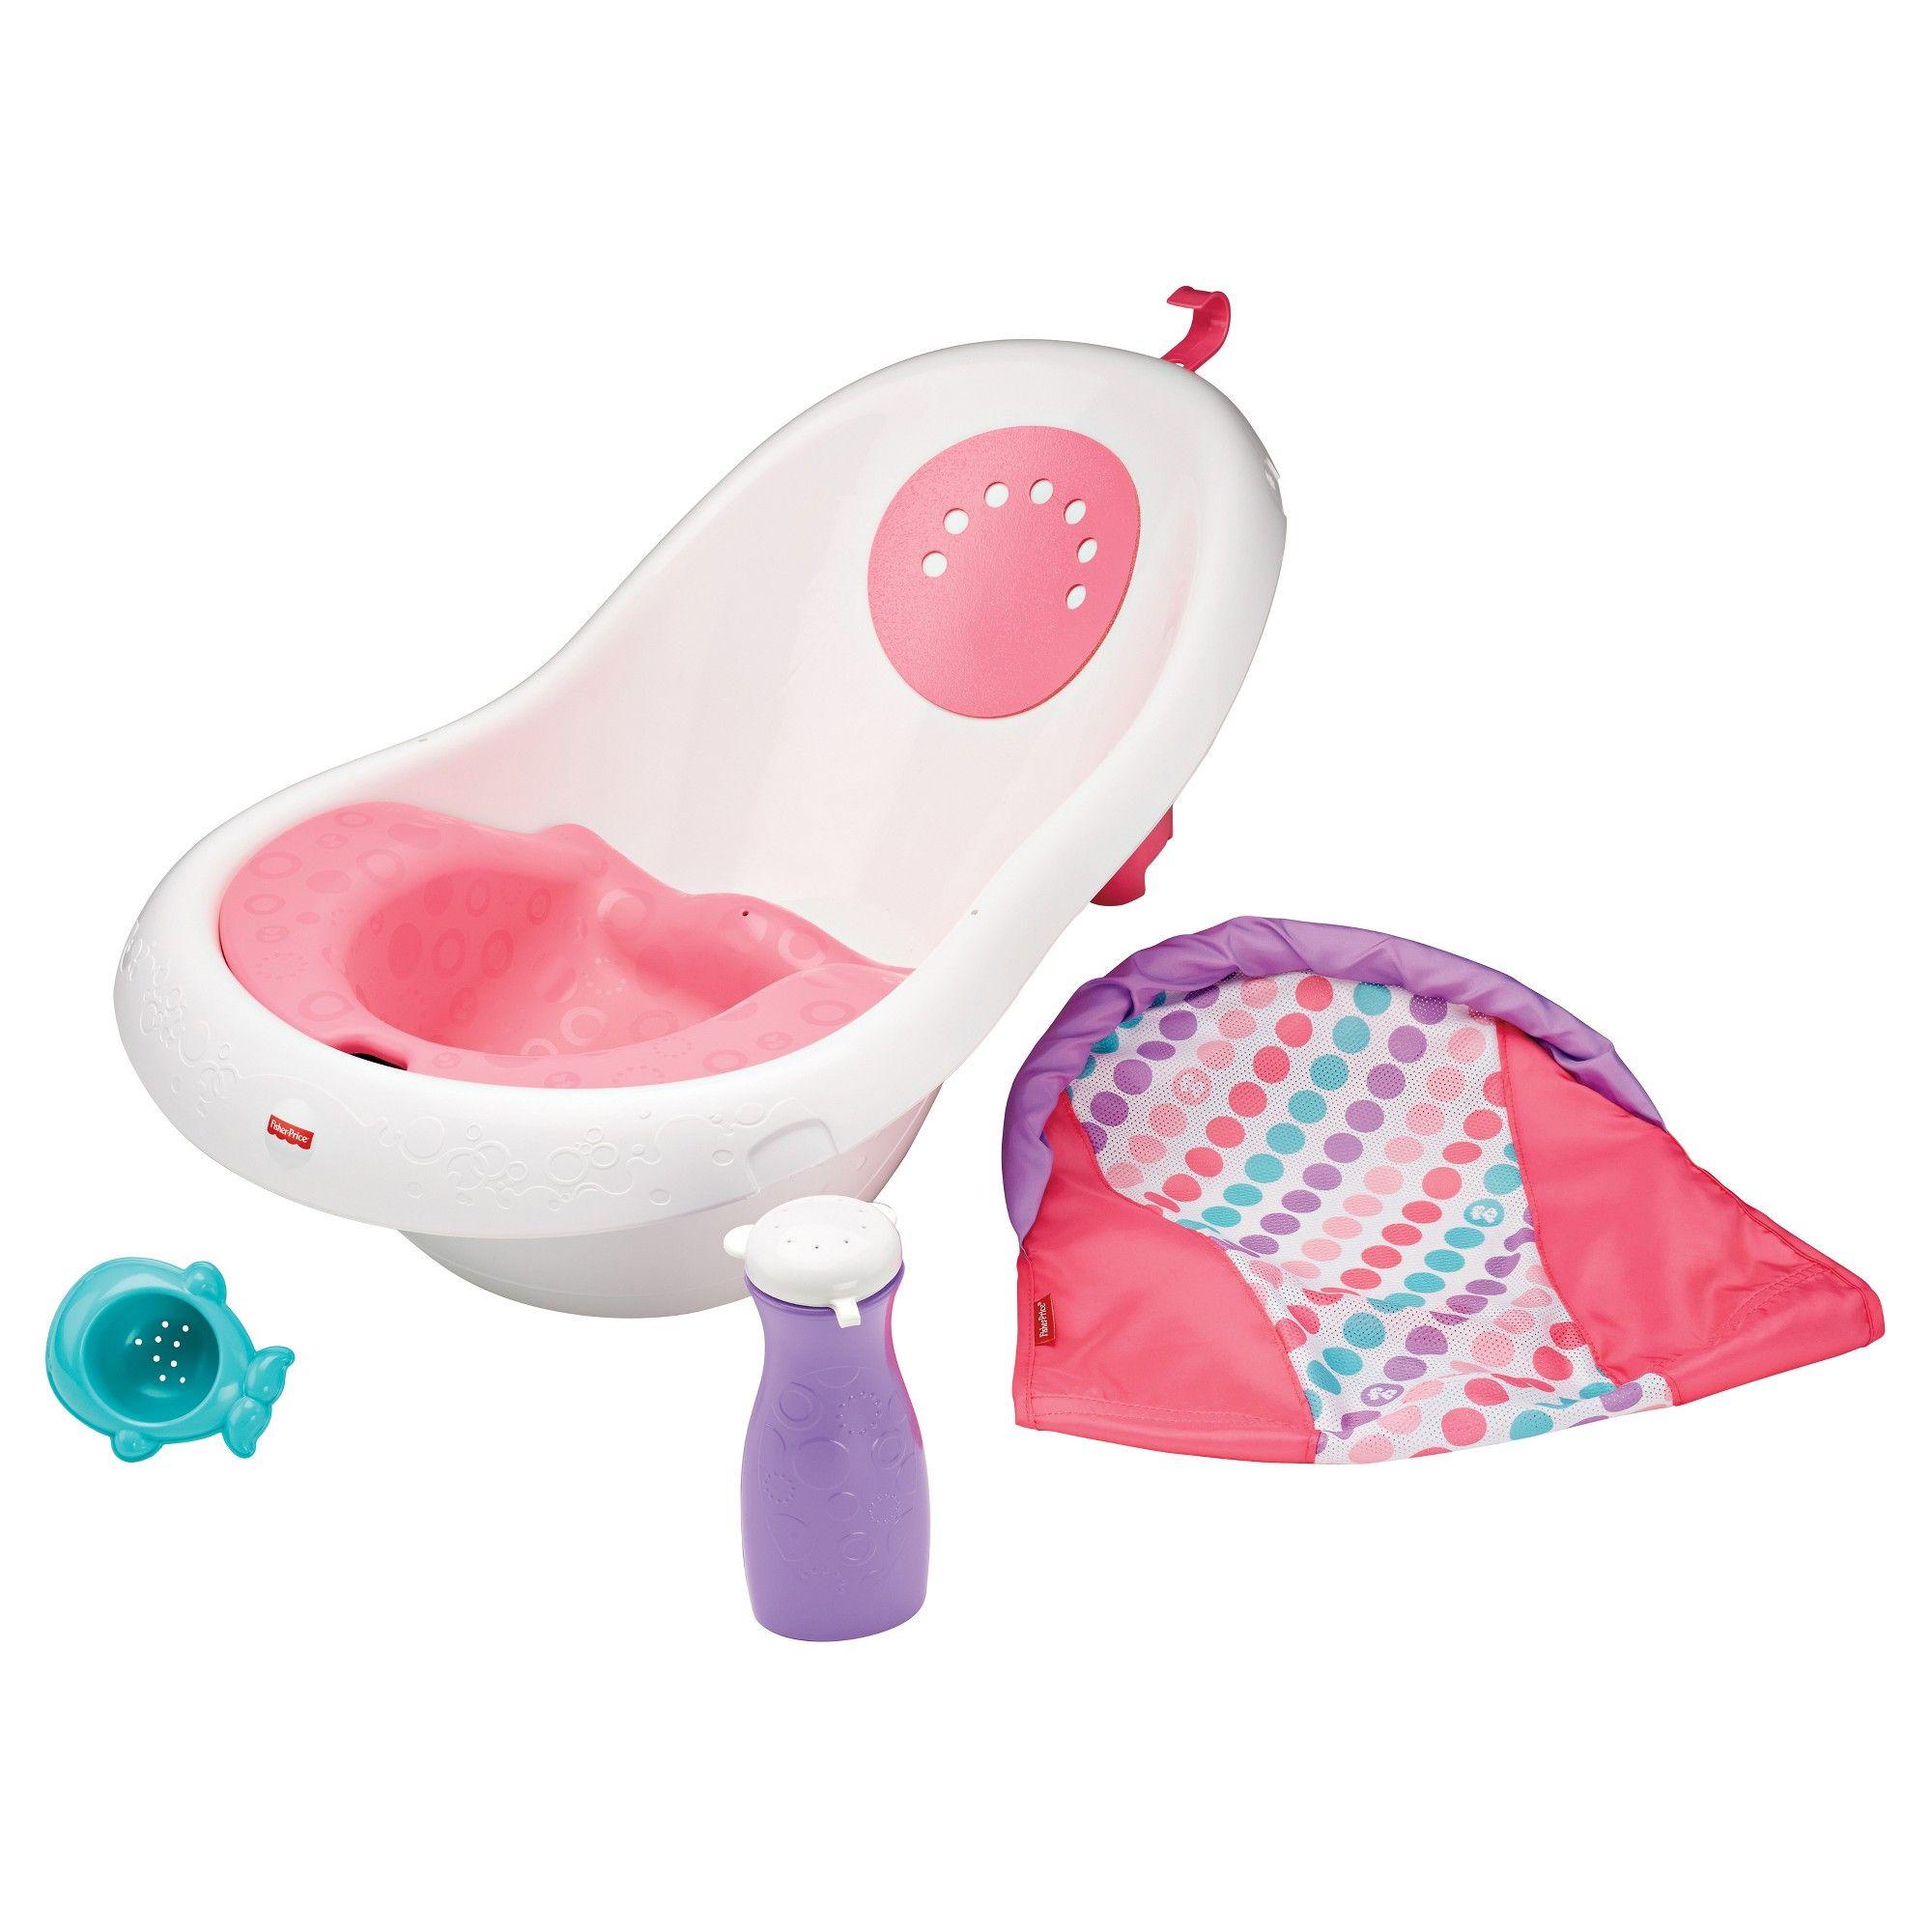 FisherPrice Bath Tub, White Baby tub, Baby car seats